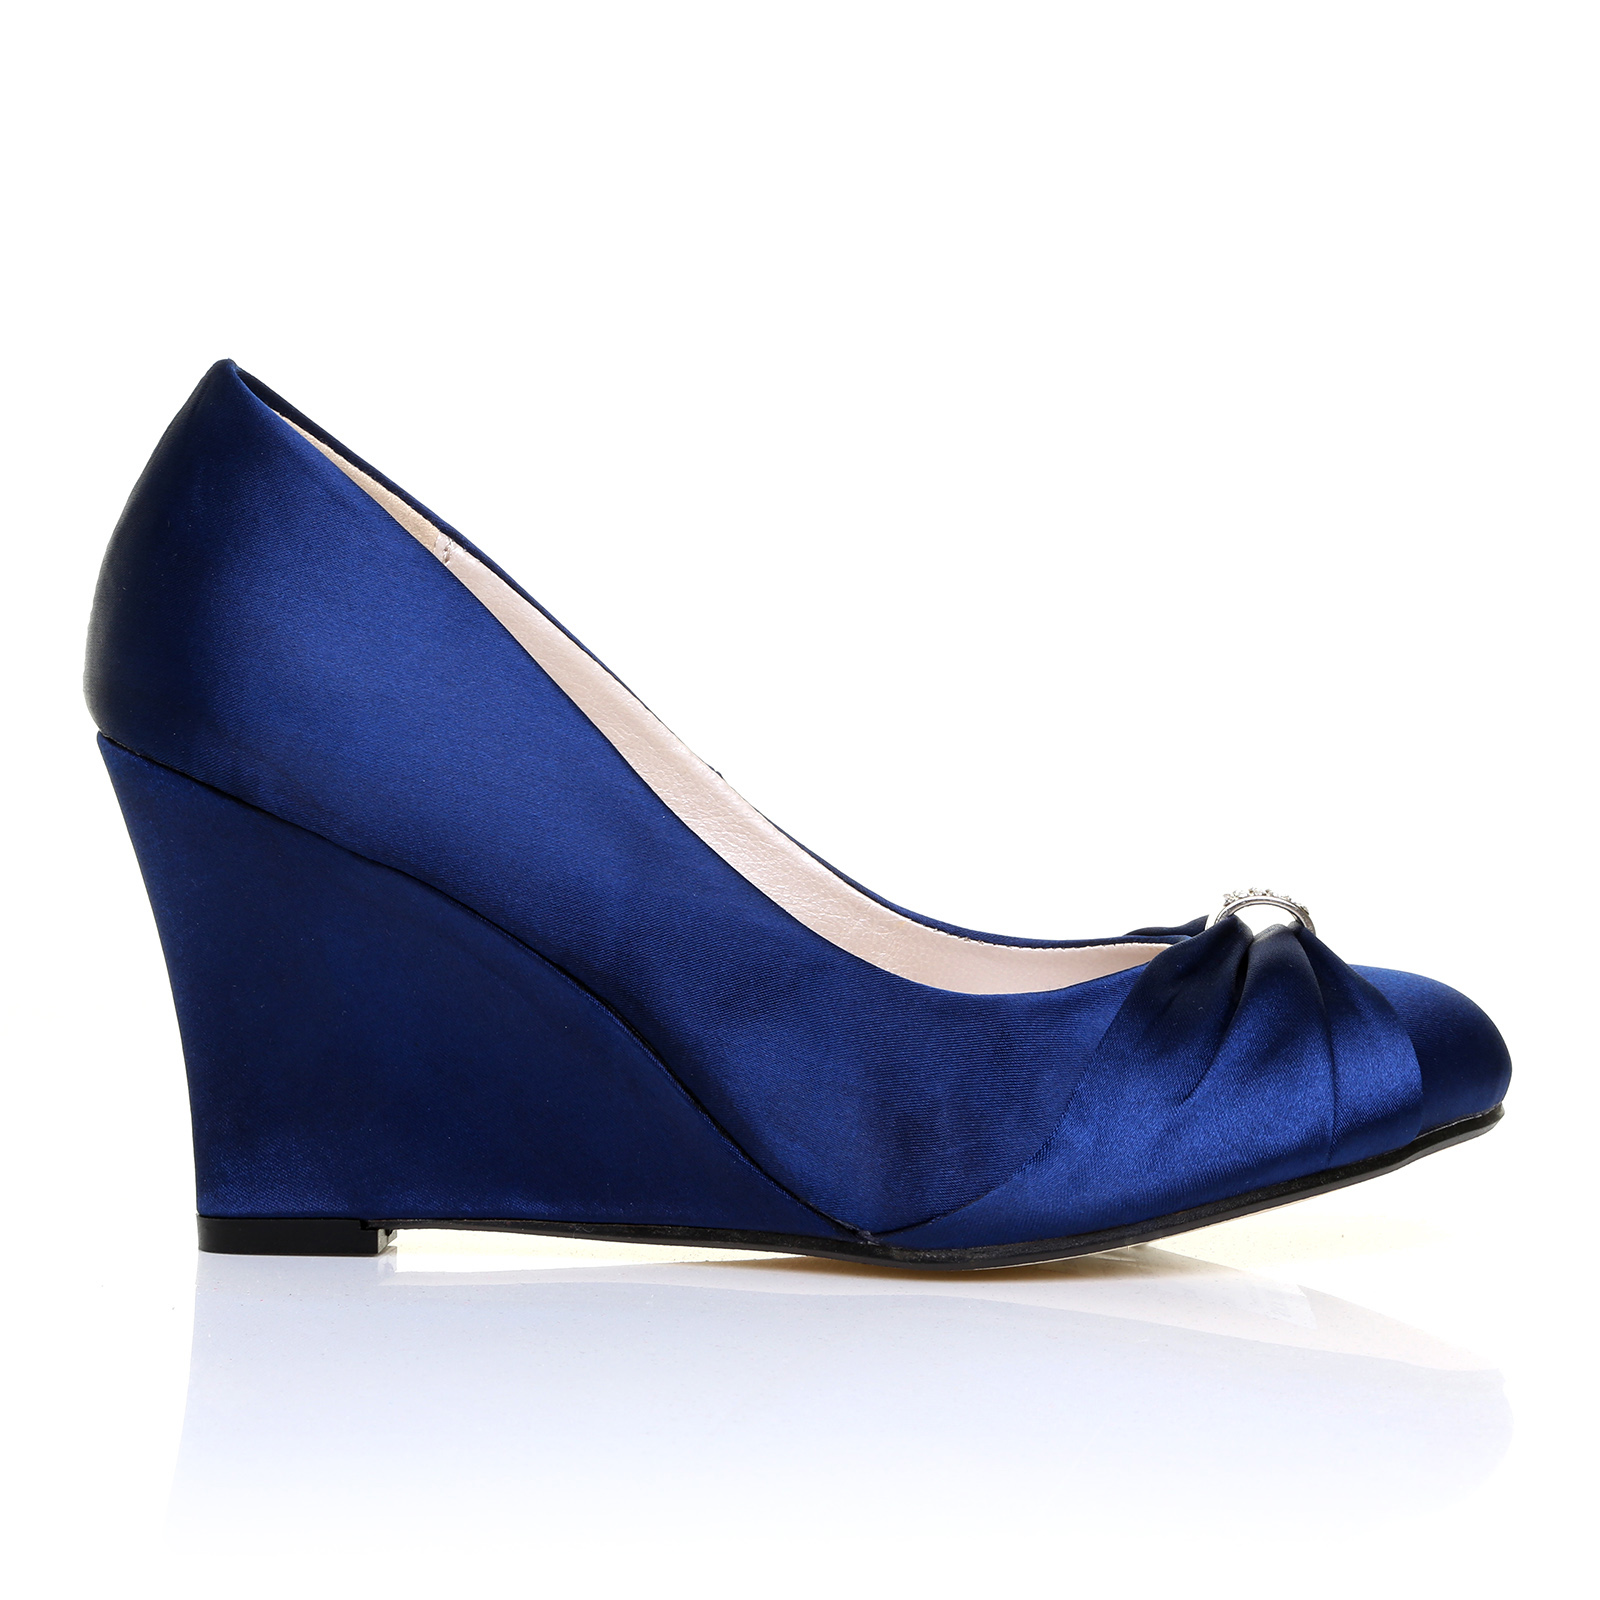 navy satin wedge high heel bridal court shoes ebay